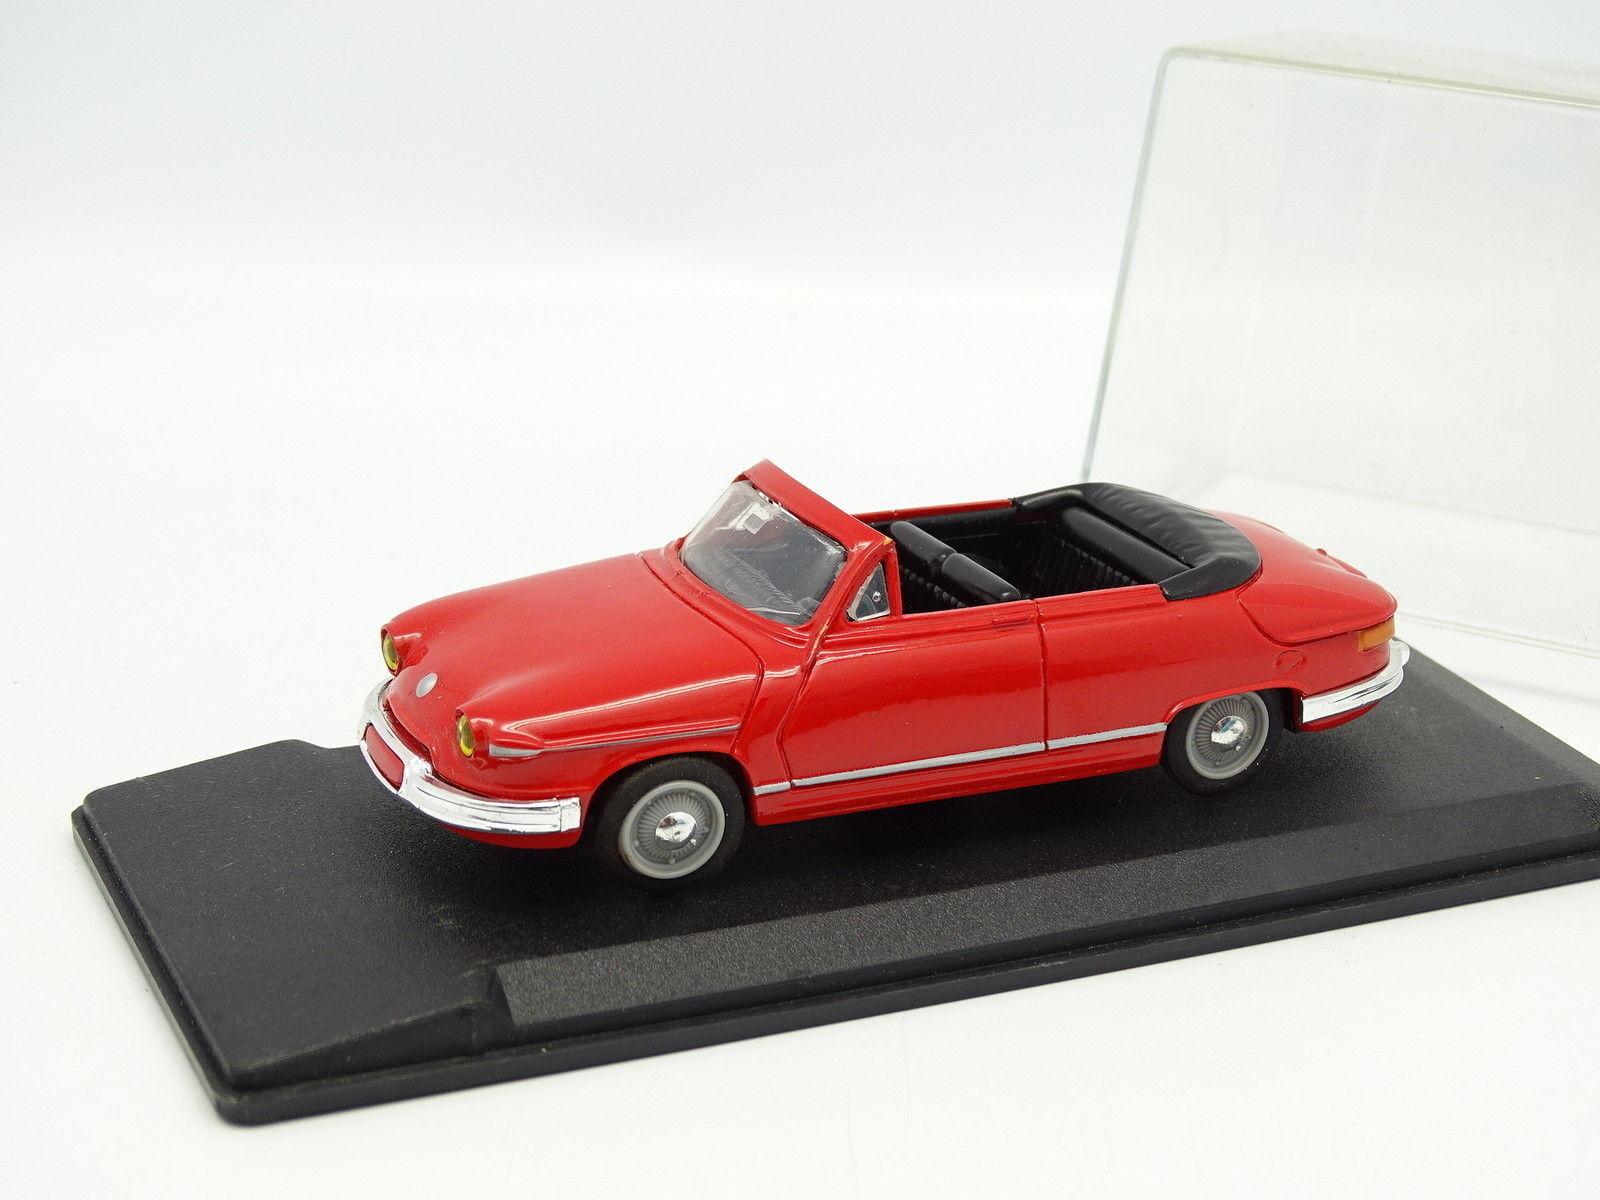 Leader Resina 1 43 - Panhard PL17 Cabrio red